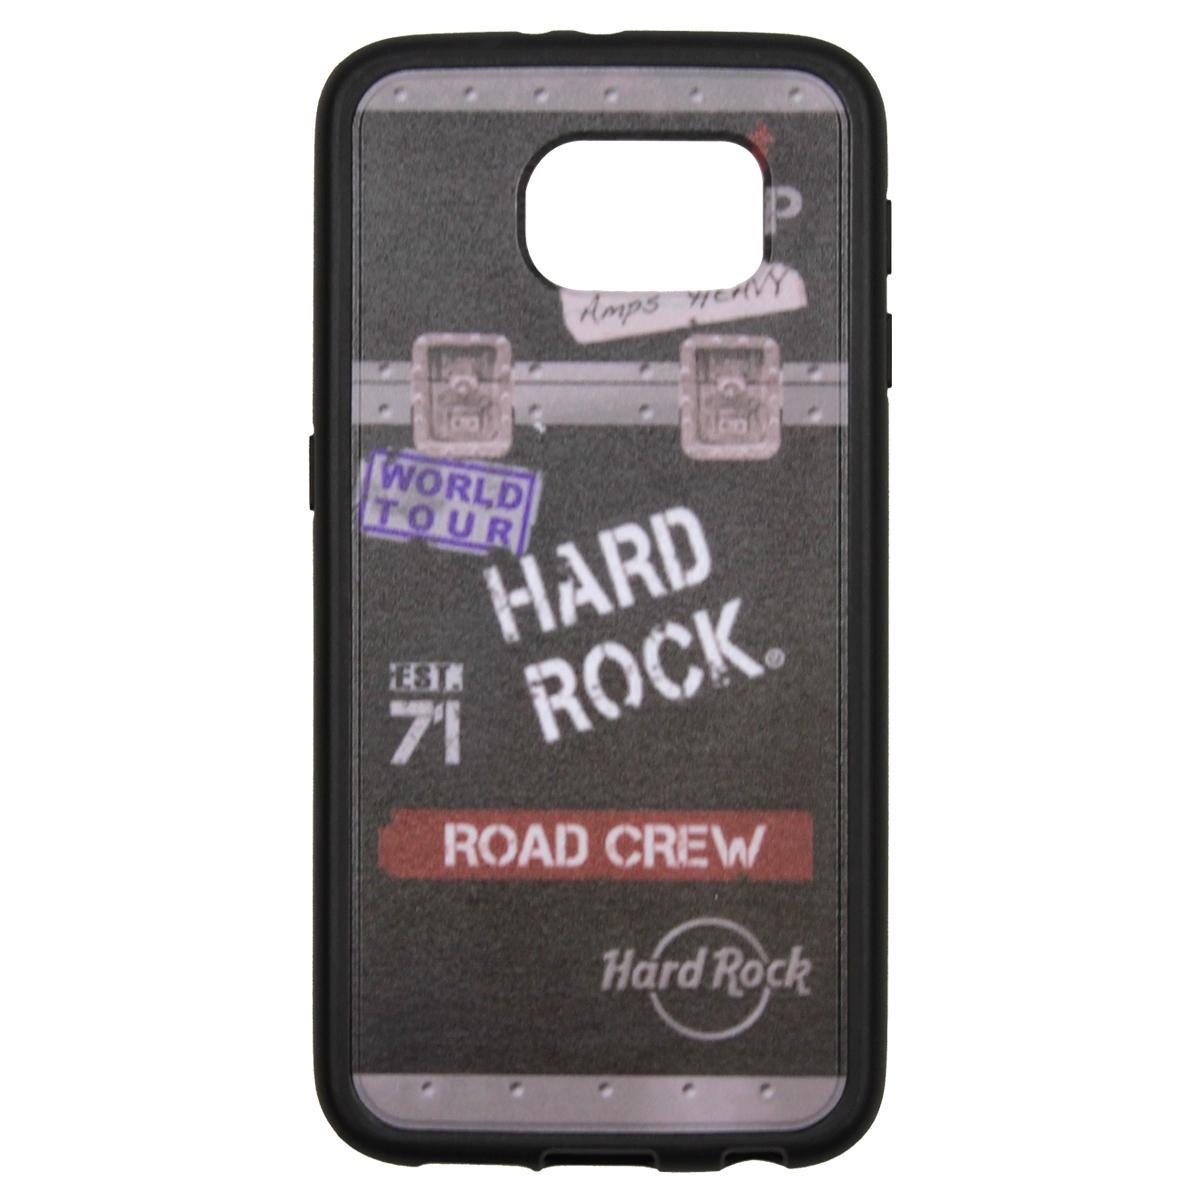 Roadie Cell Phone Case 0